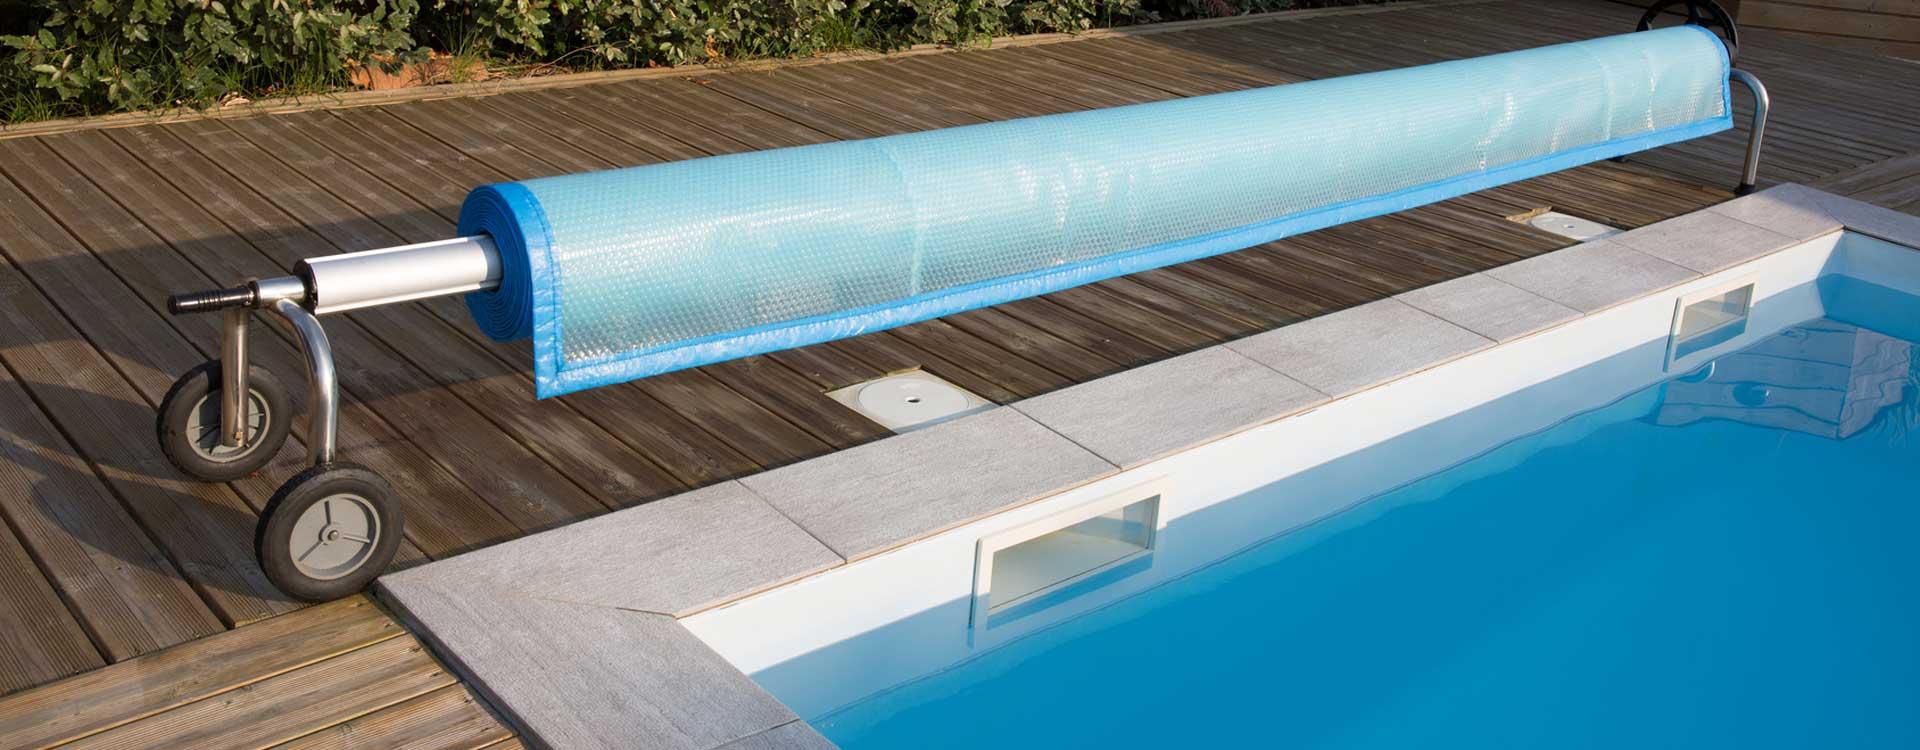 bache piscine hiver sur mesure designo b ches suisse. Black Bedroom Furniture Sets. Home Design Ideas